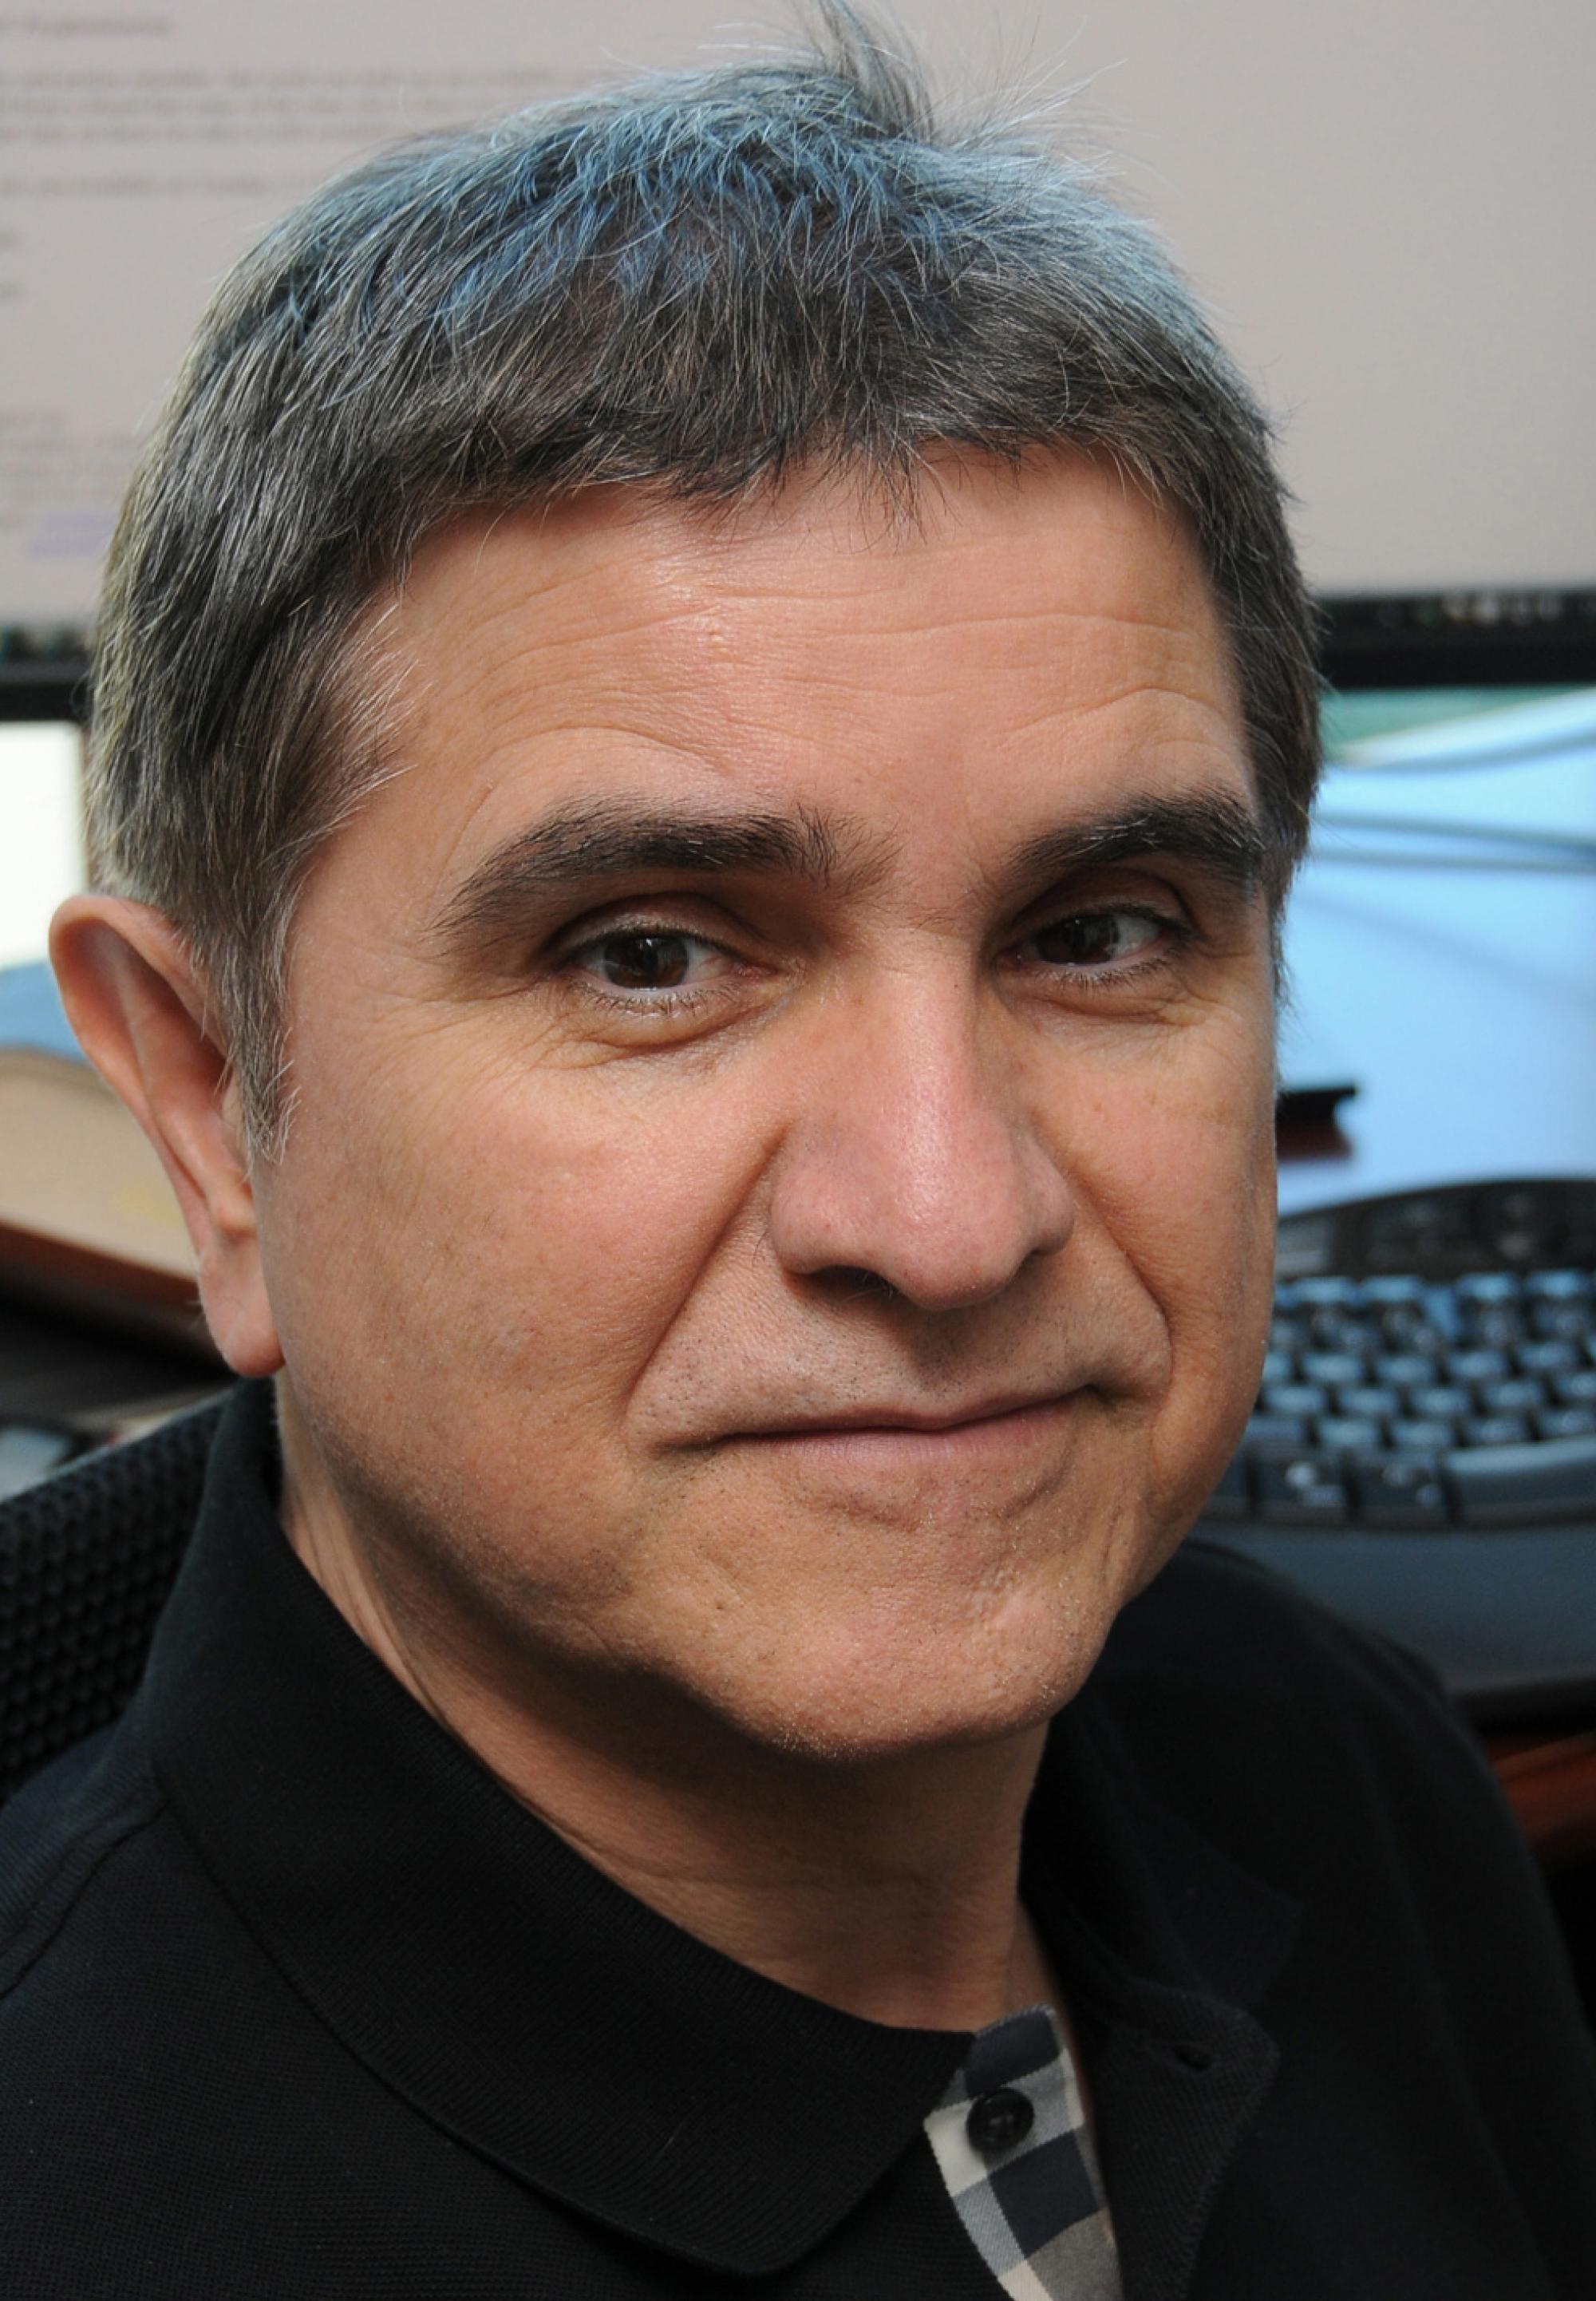 CIAN director Nasser Peyghambarian